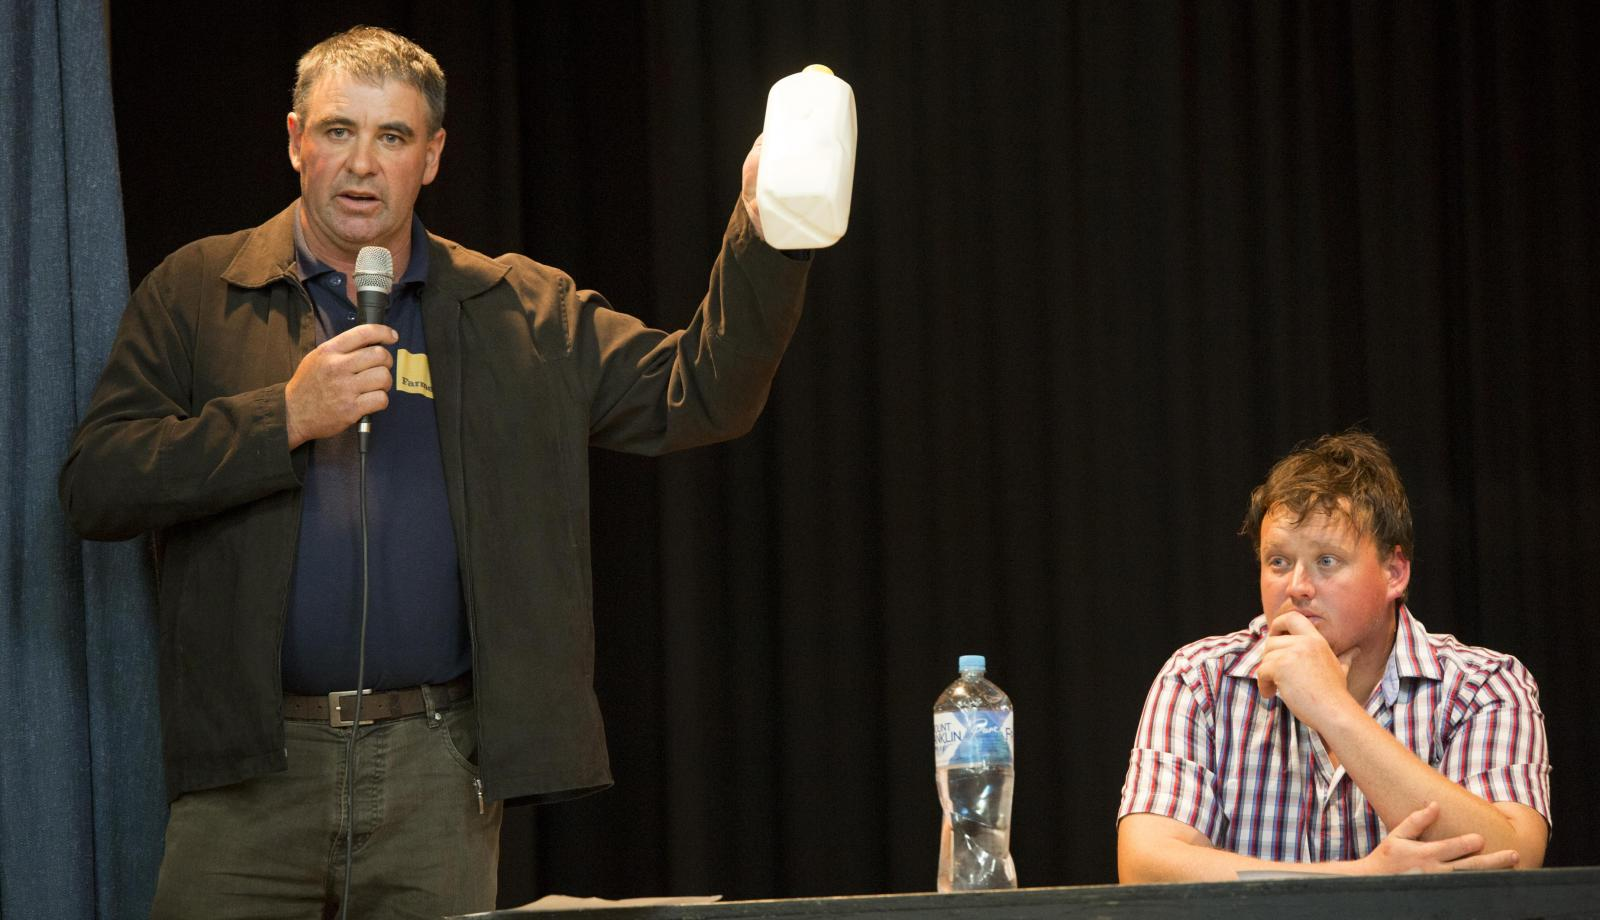 Farmers protest milk price cuts